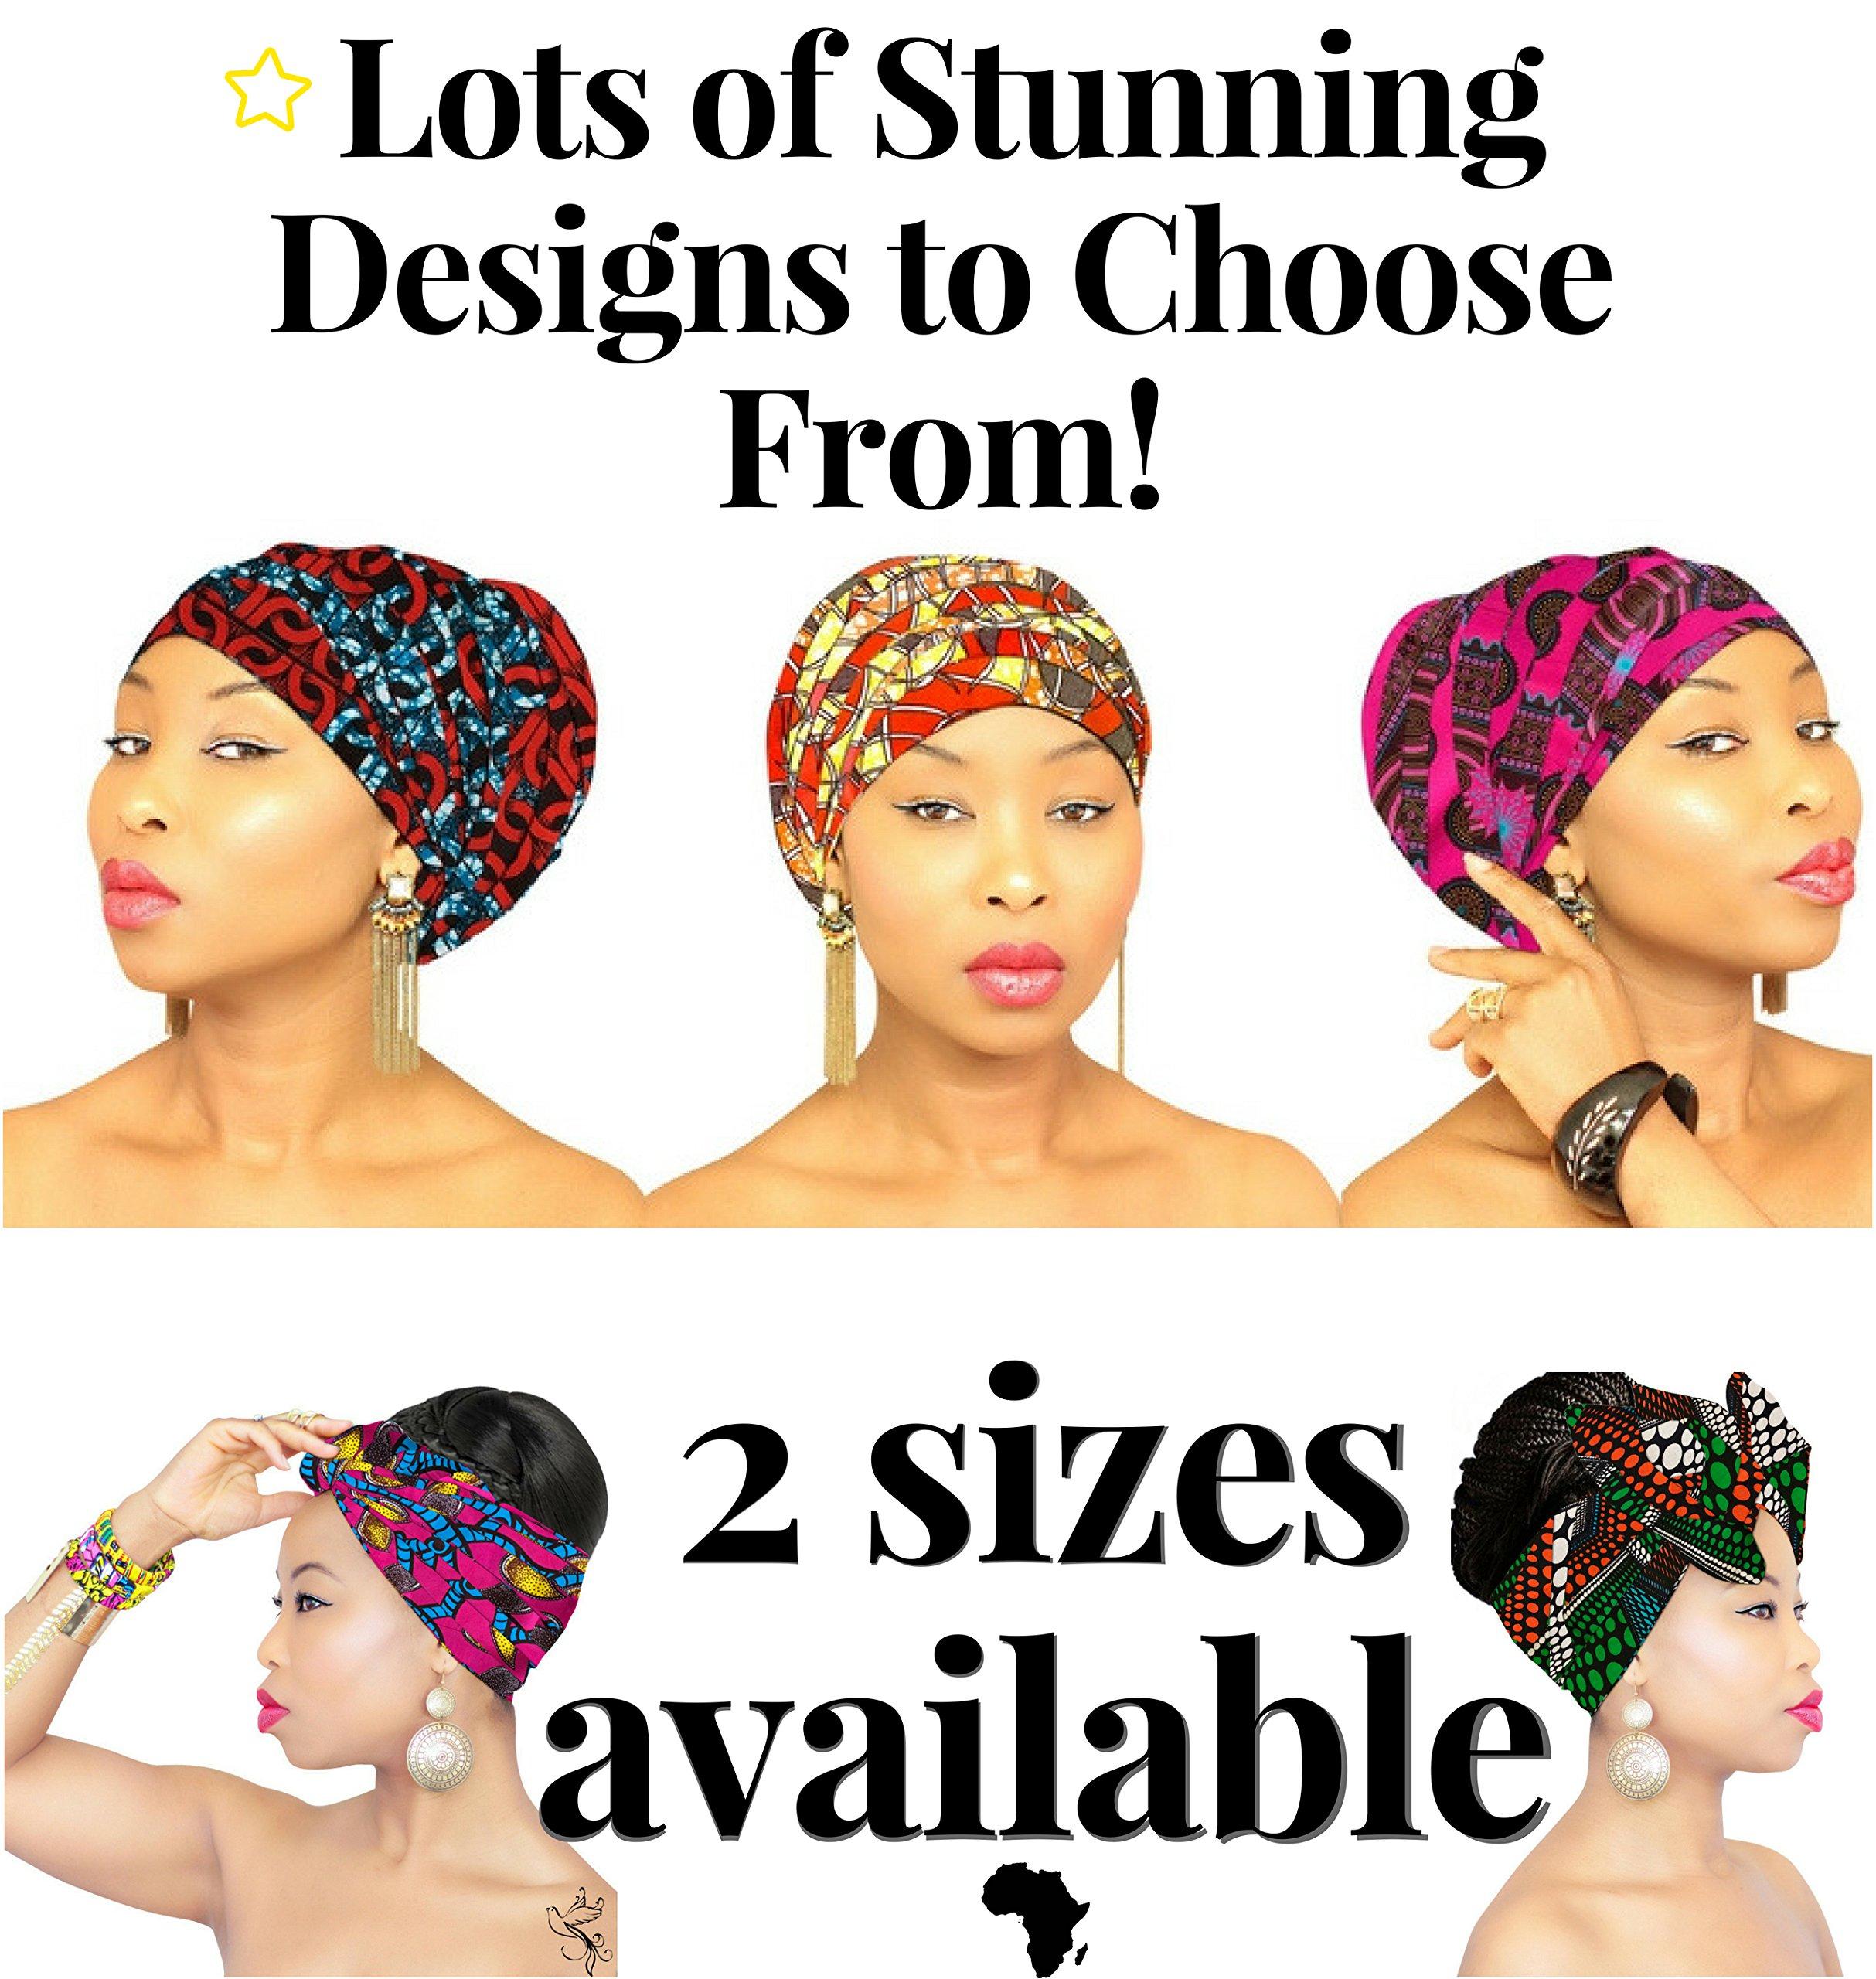 African Head Wrap   HEADBAND   HEAD WRAP   Hijab   PREMIUM QUALITY HEAD WRAP African Head Wraps Hair Loss African Fabric Turban Headband Muslim Head Cover Under Scarf by Royal Head Wraps (Image #5)